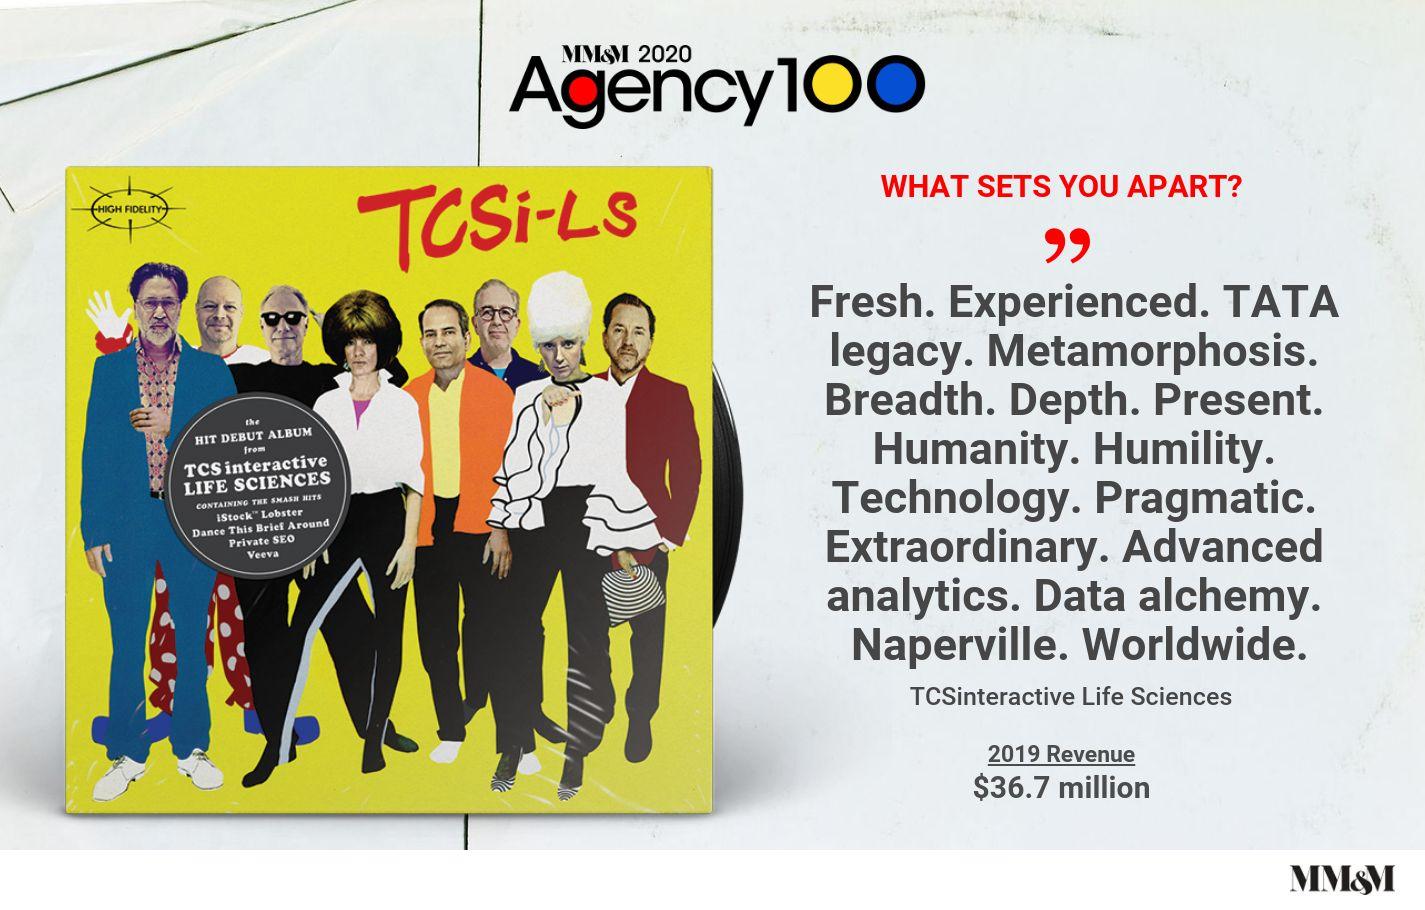 Agency 100 2020: TCSinteractive Life Sciences